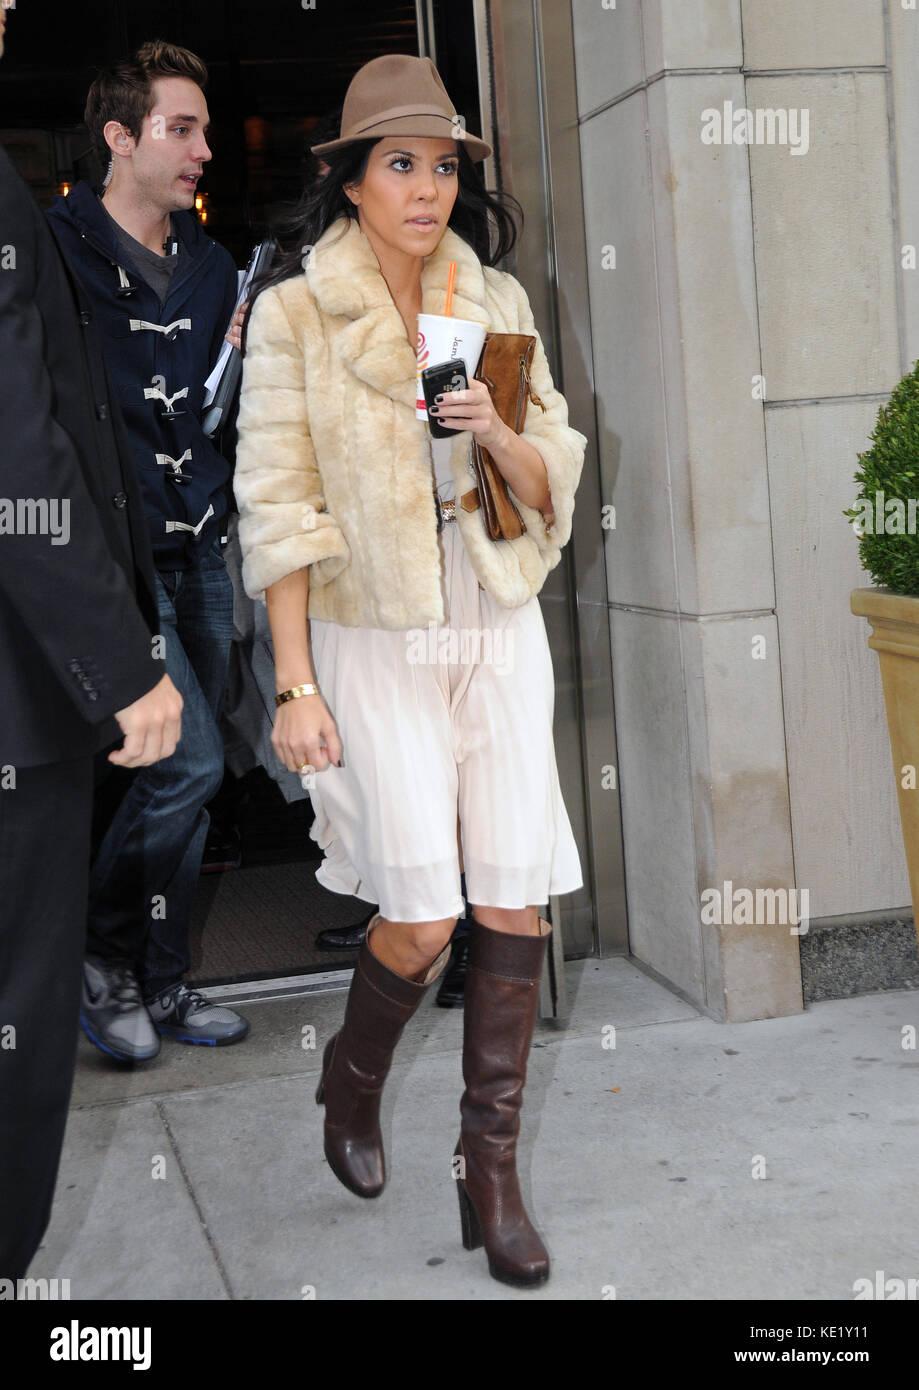 NEW YORK - NOVEMBER 06: TV personalities Kim Kardashian and